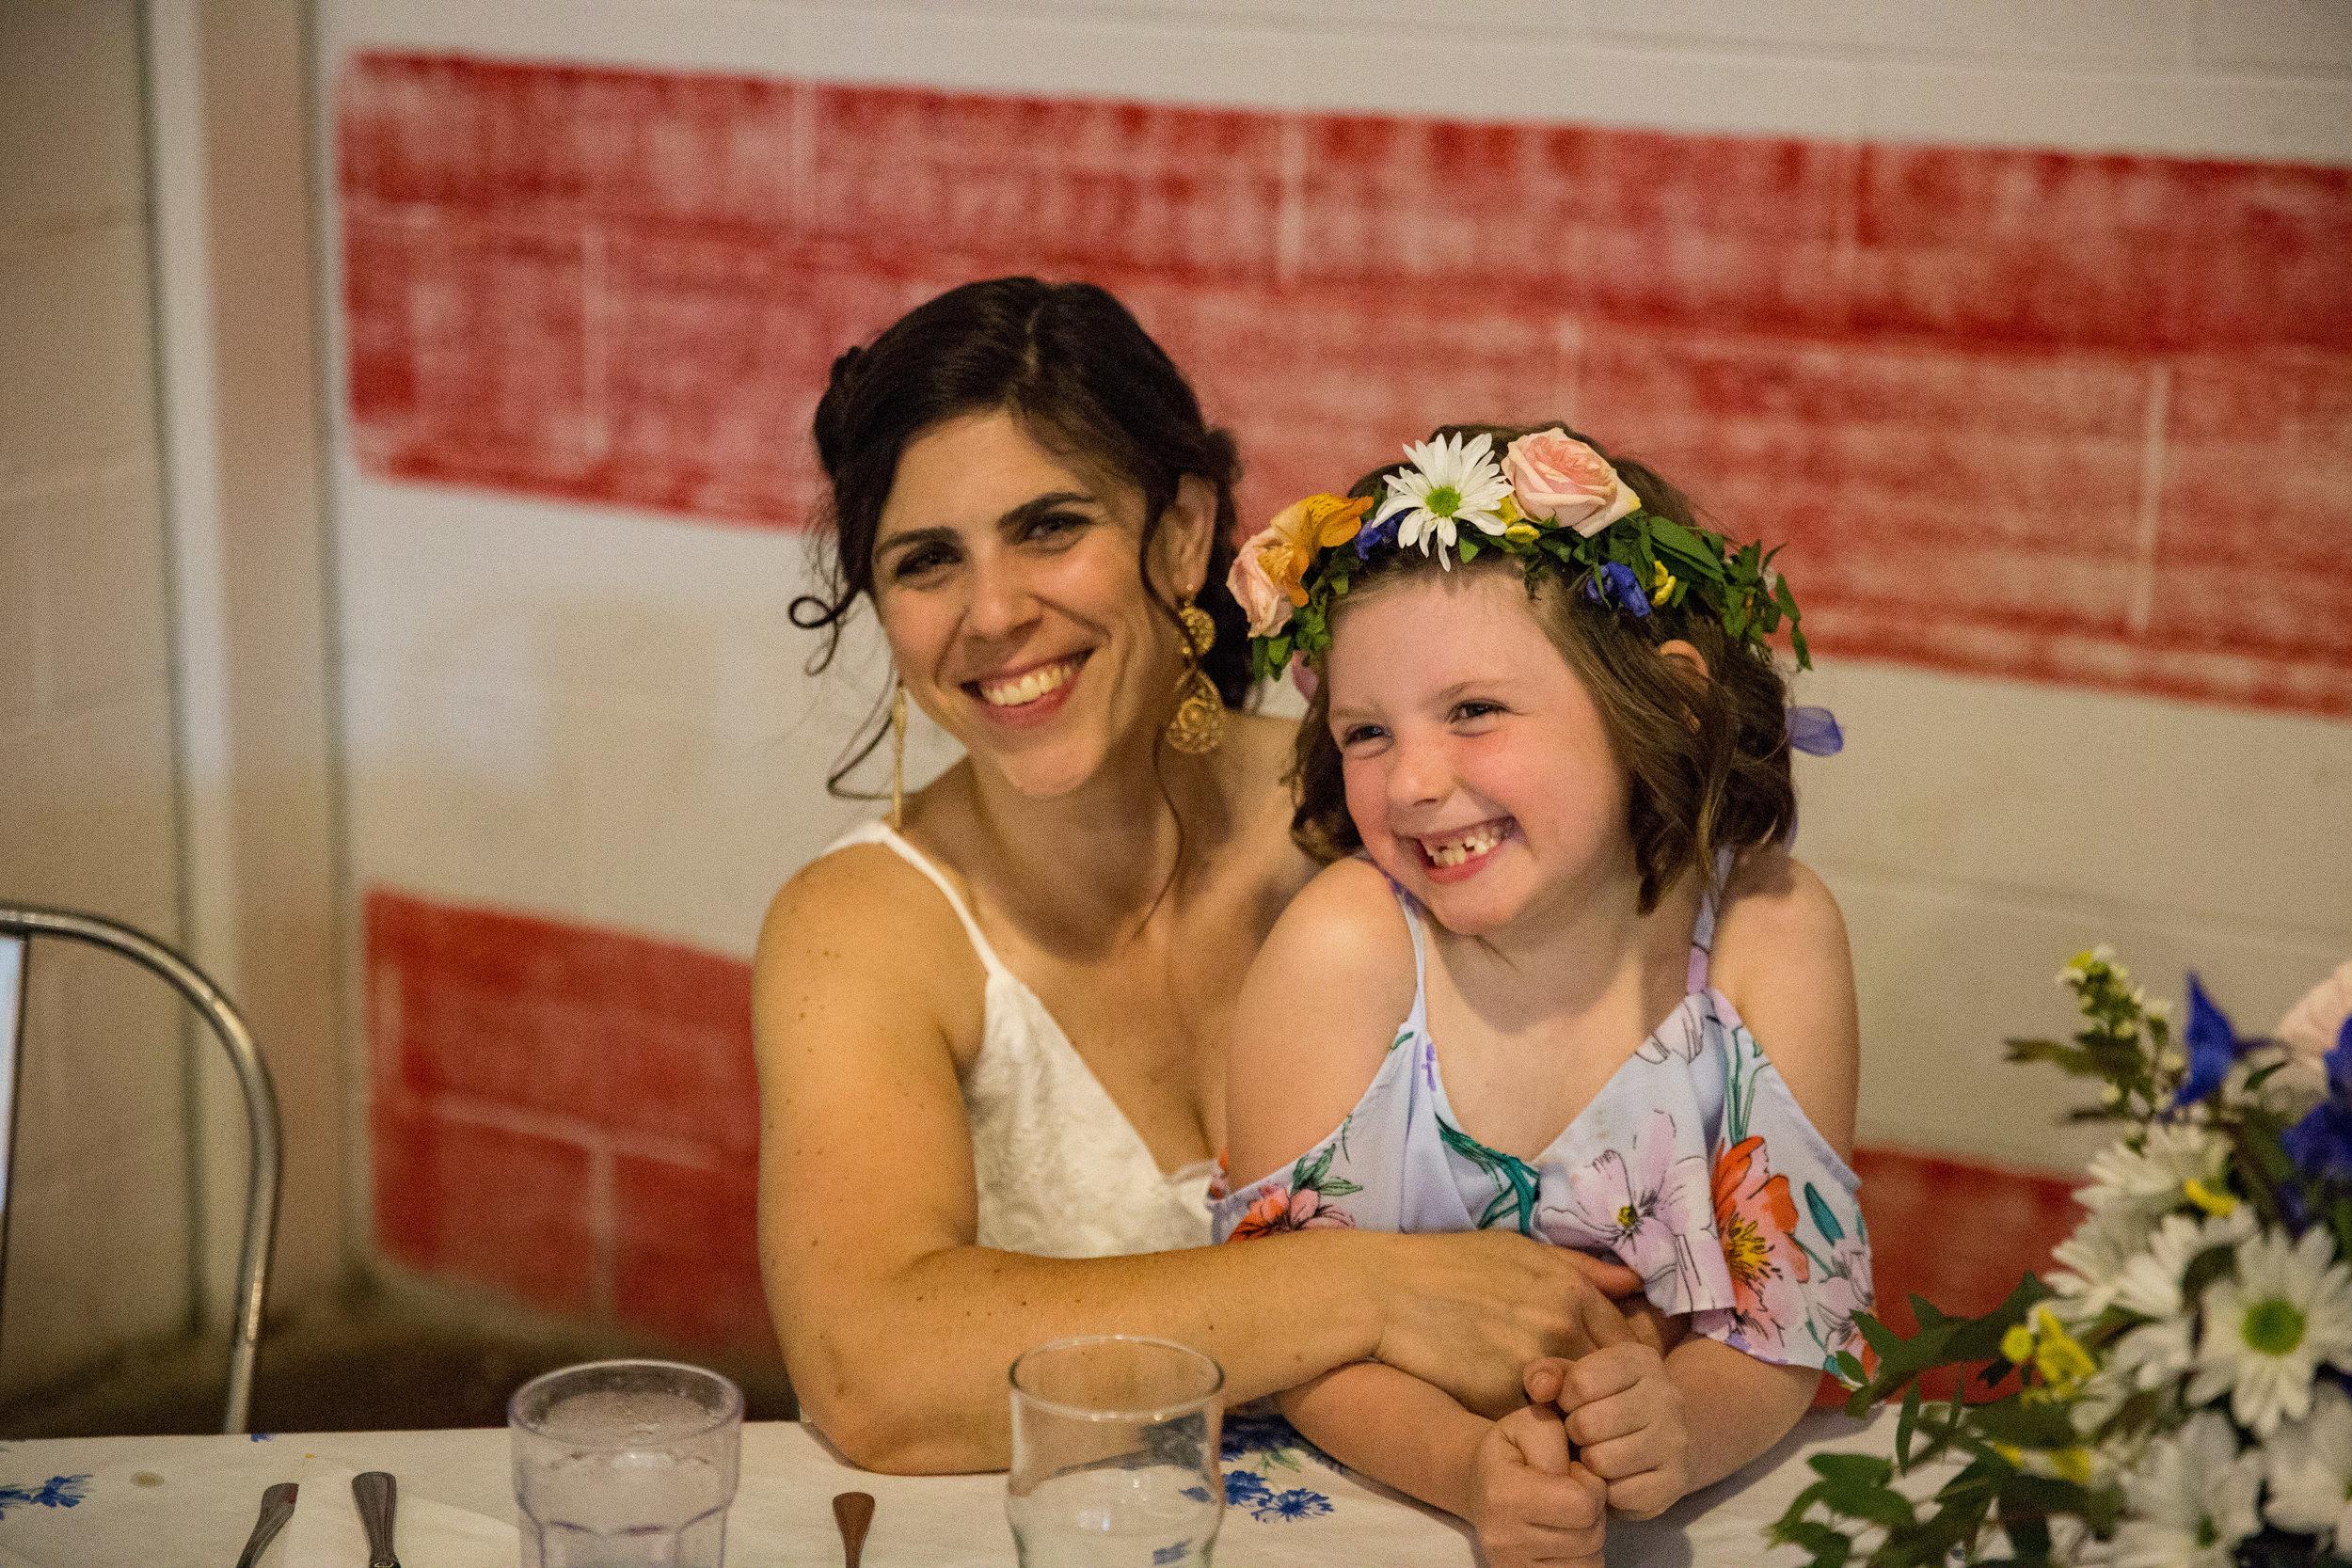 Natalie and Dallas Mooney Wedding 6-8-19_Tania Watt Photography-502.jpg